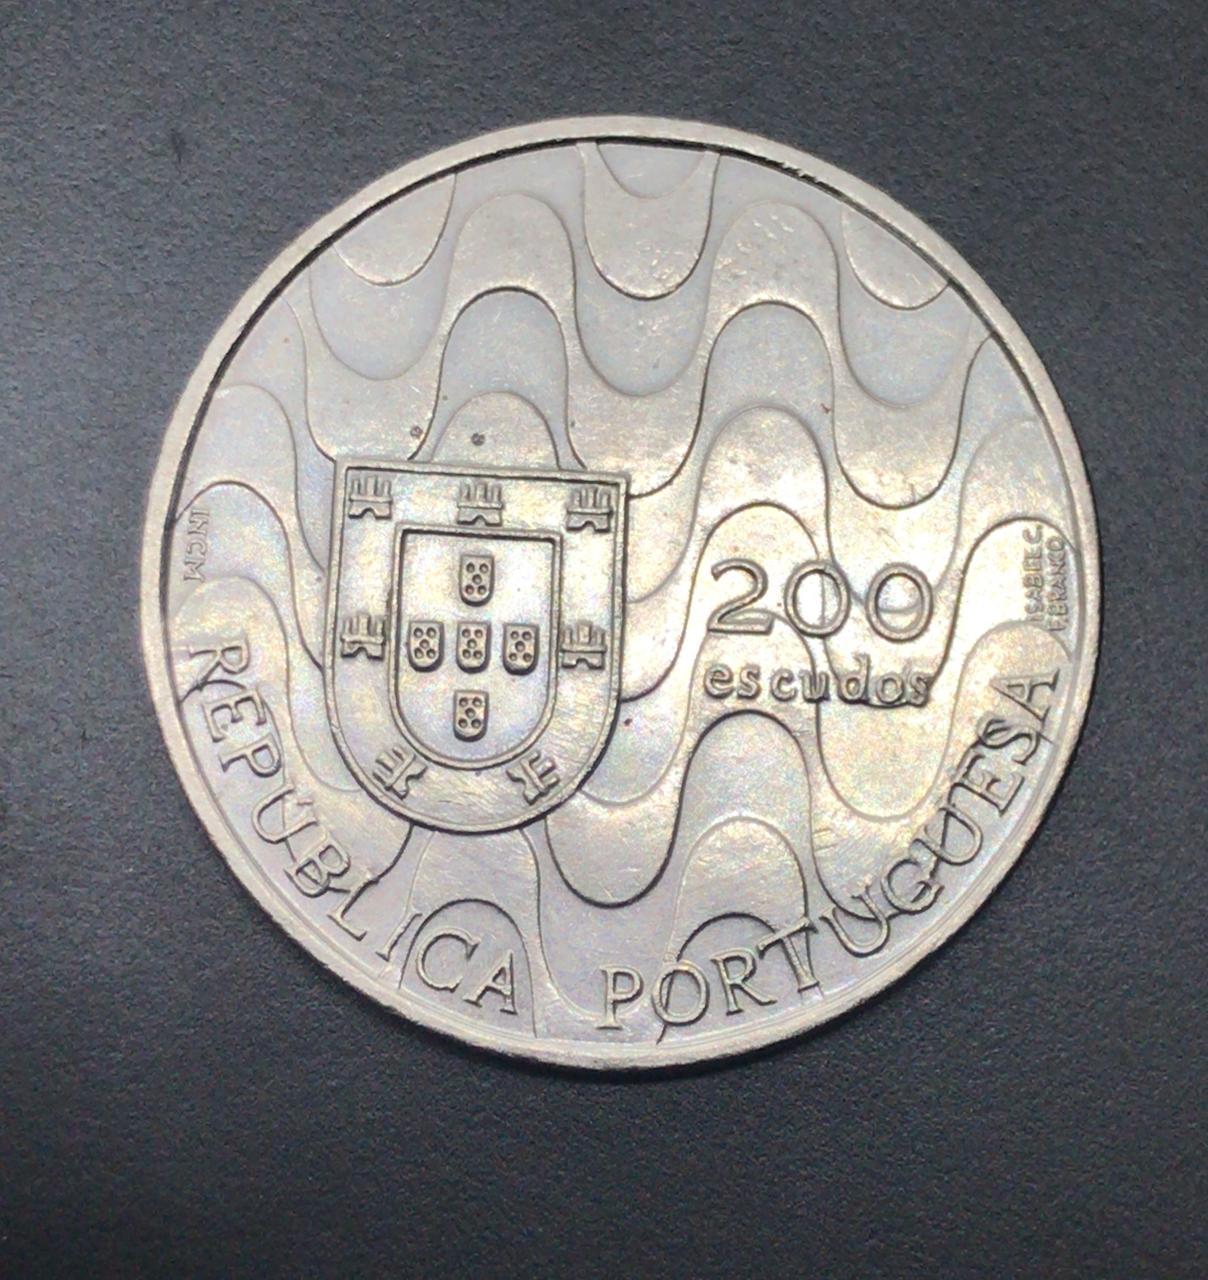 Moeda de Portugal 200 Escudos - Presidência da comunidade europeia - 1992